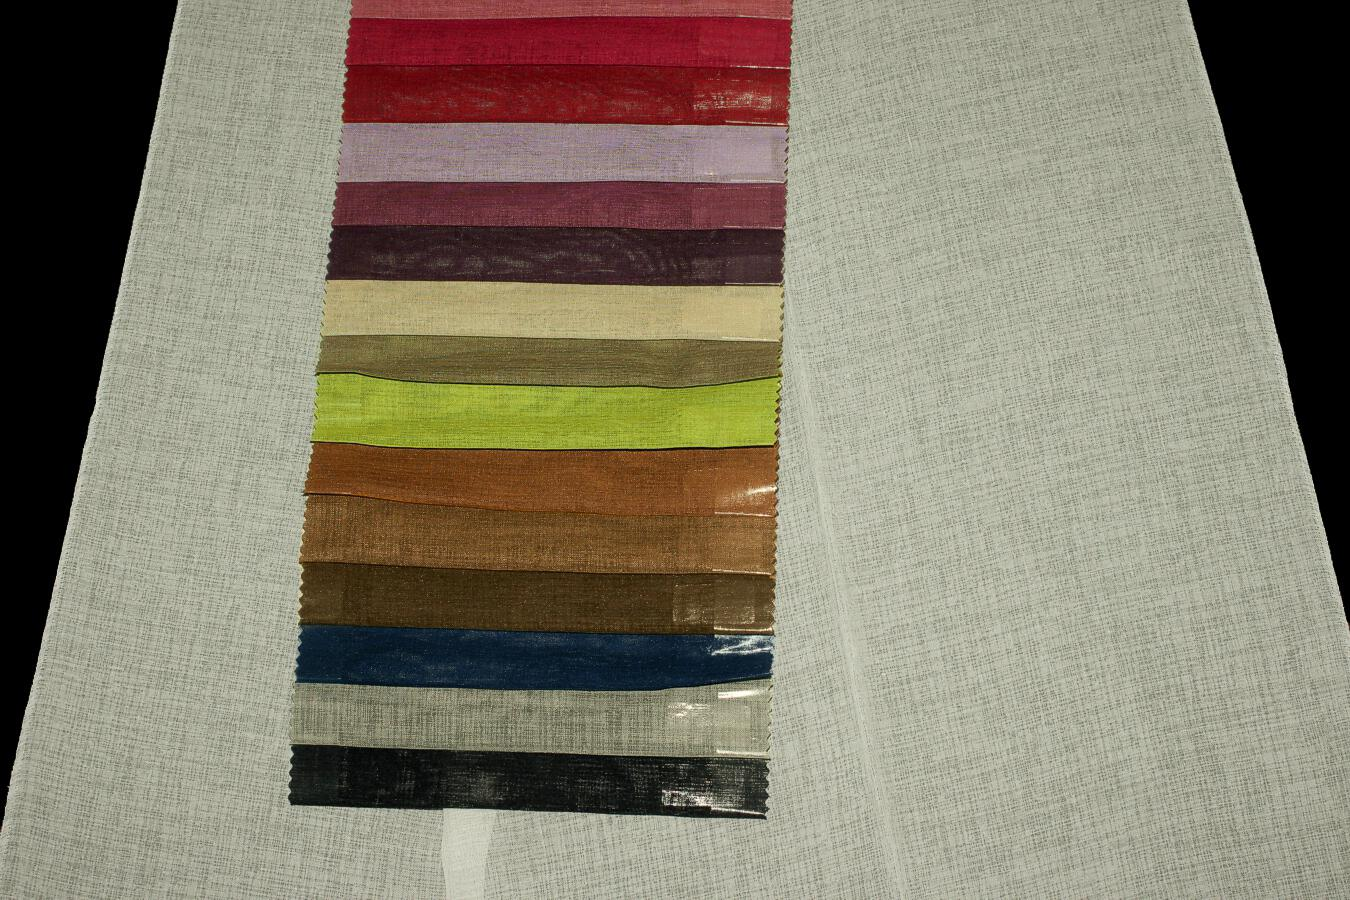 Záclona Mira 300 cm s olůvkem 073 černá